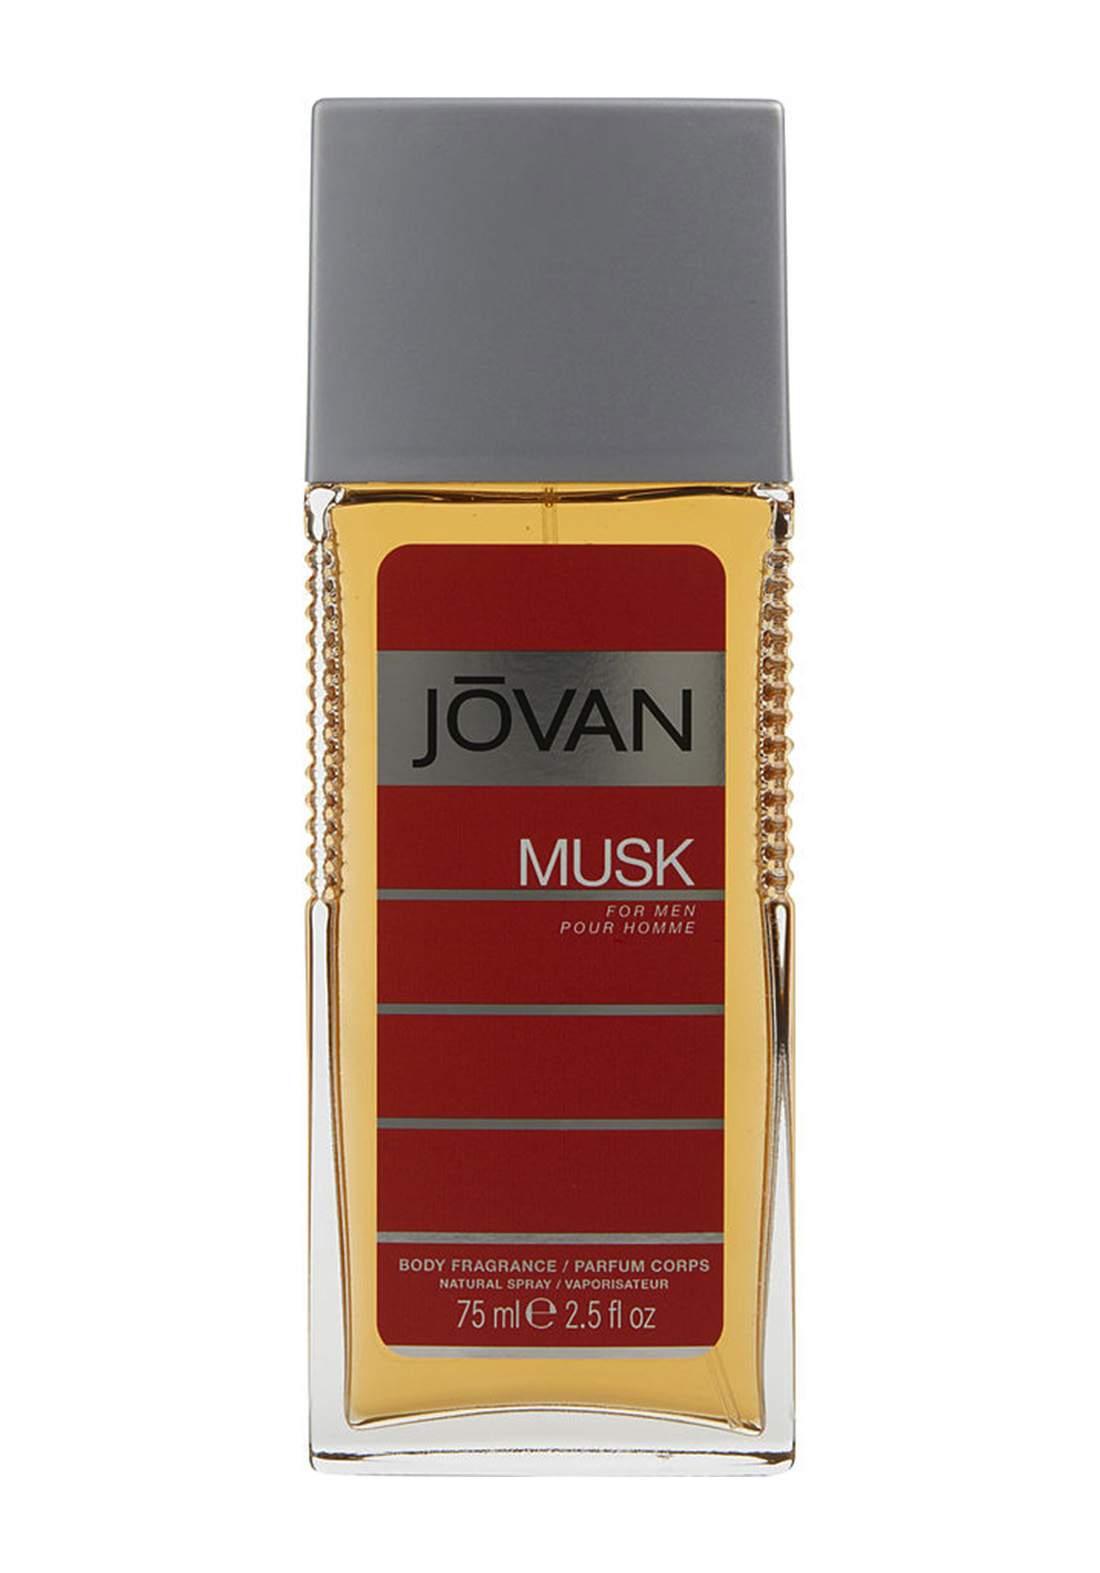 Jovan (9266) Musk Body Spray Fragrance 75ml For Men معطر للرجال